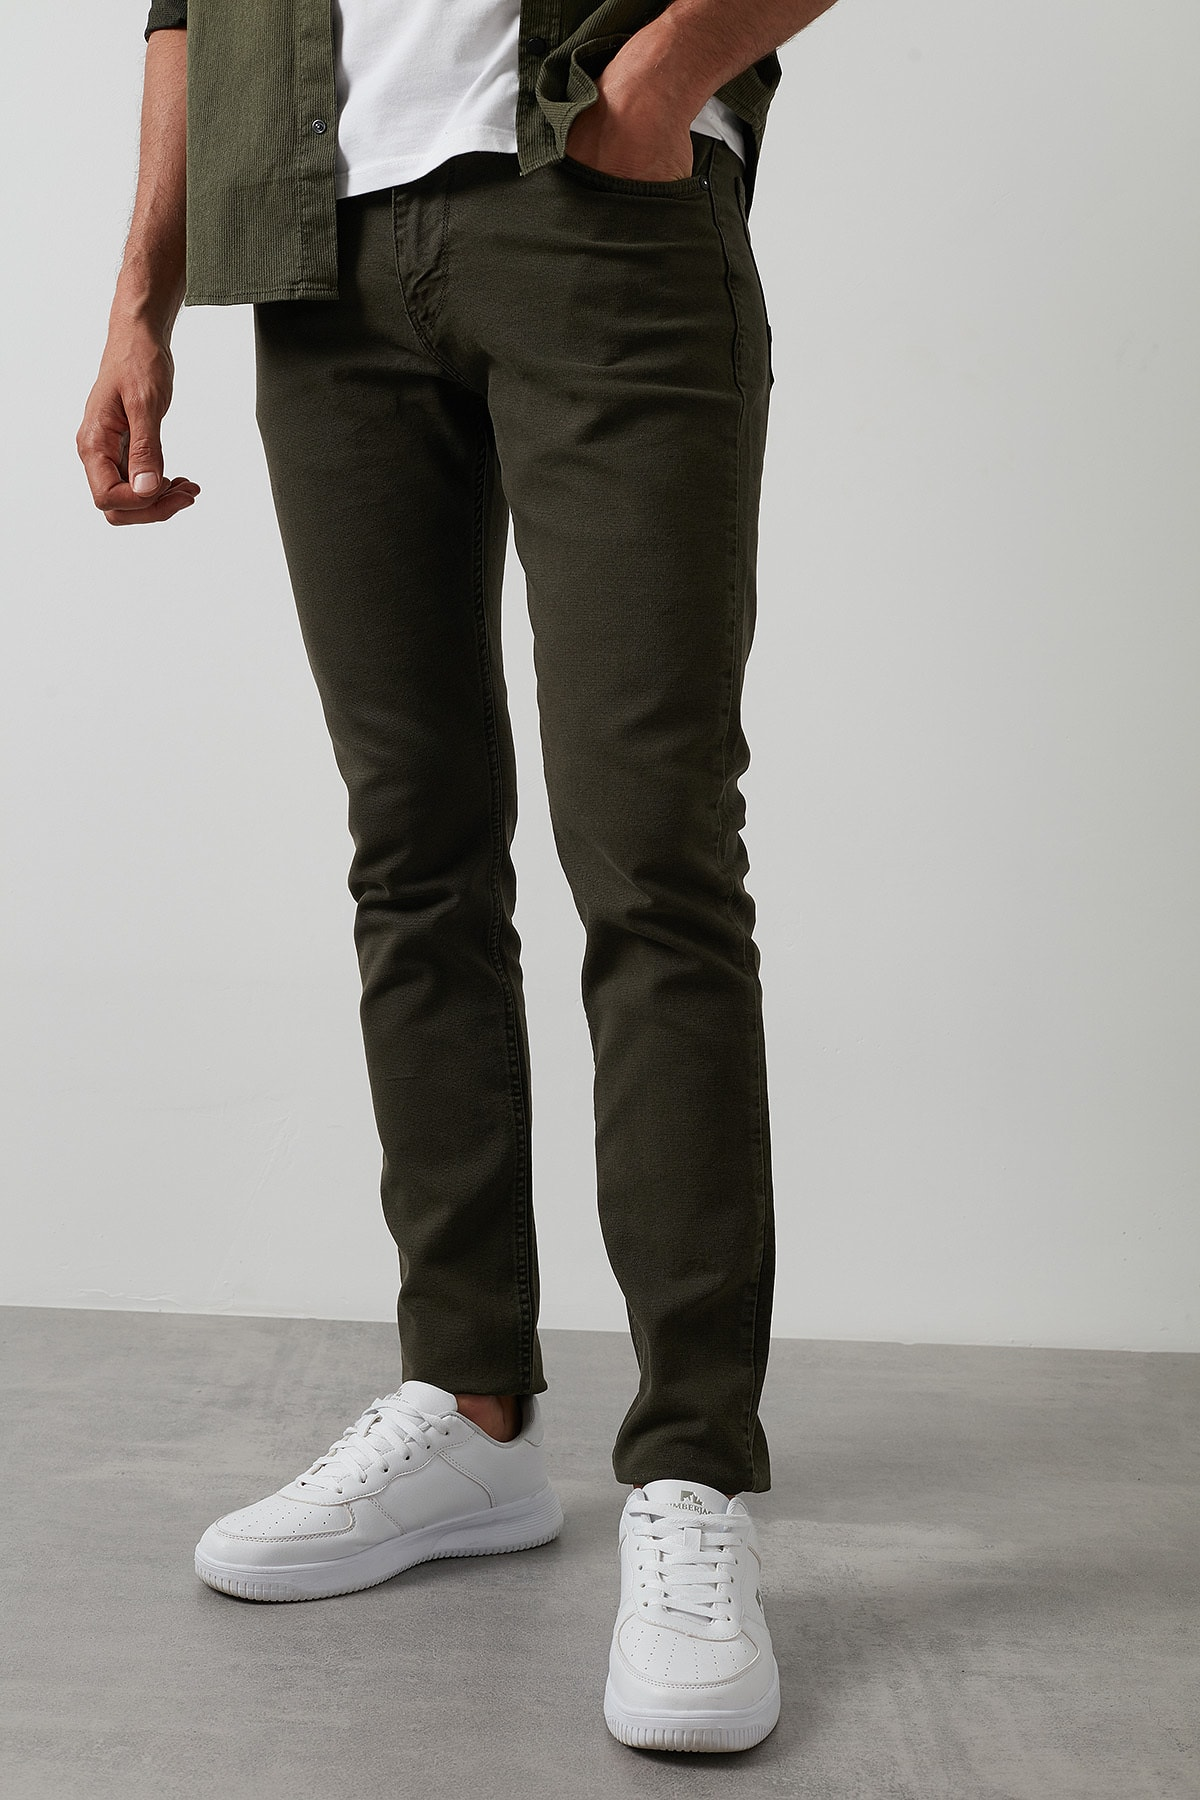 Buratti Erkek Haki 7267f4132zagor Regular Fit Pamuklu Jeans Kot Pantolon 0